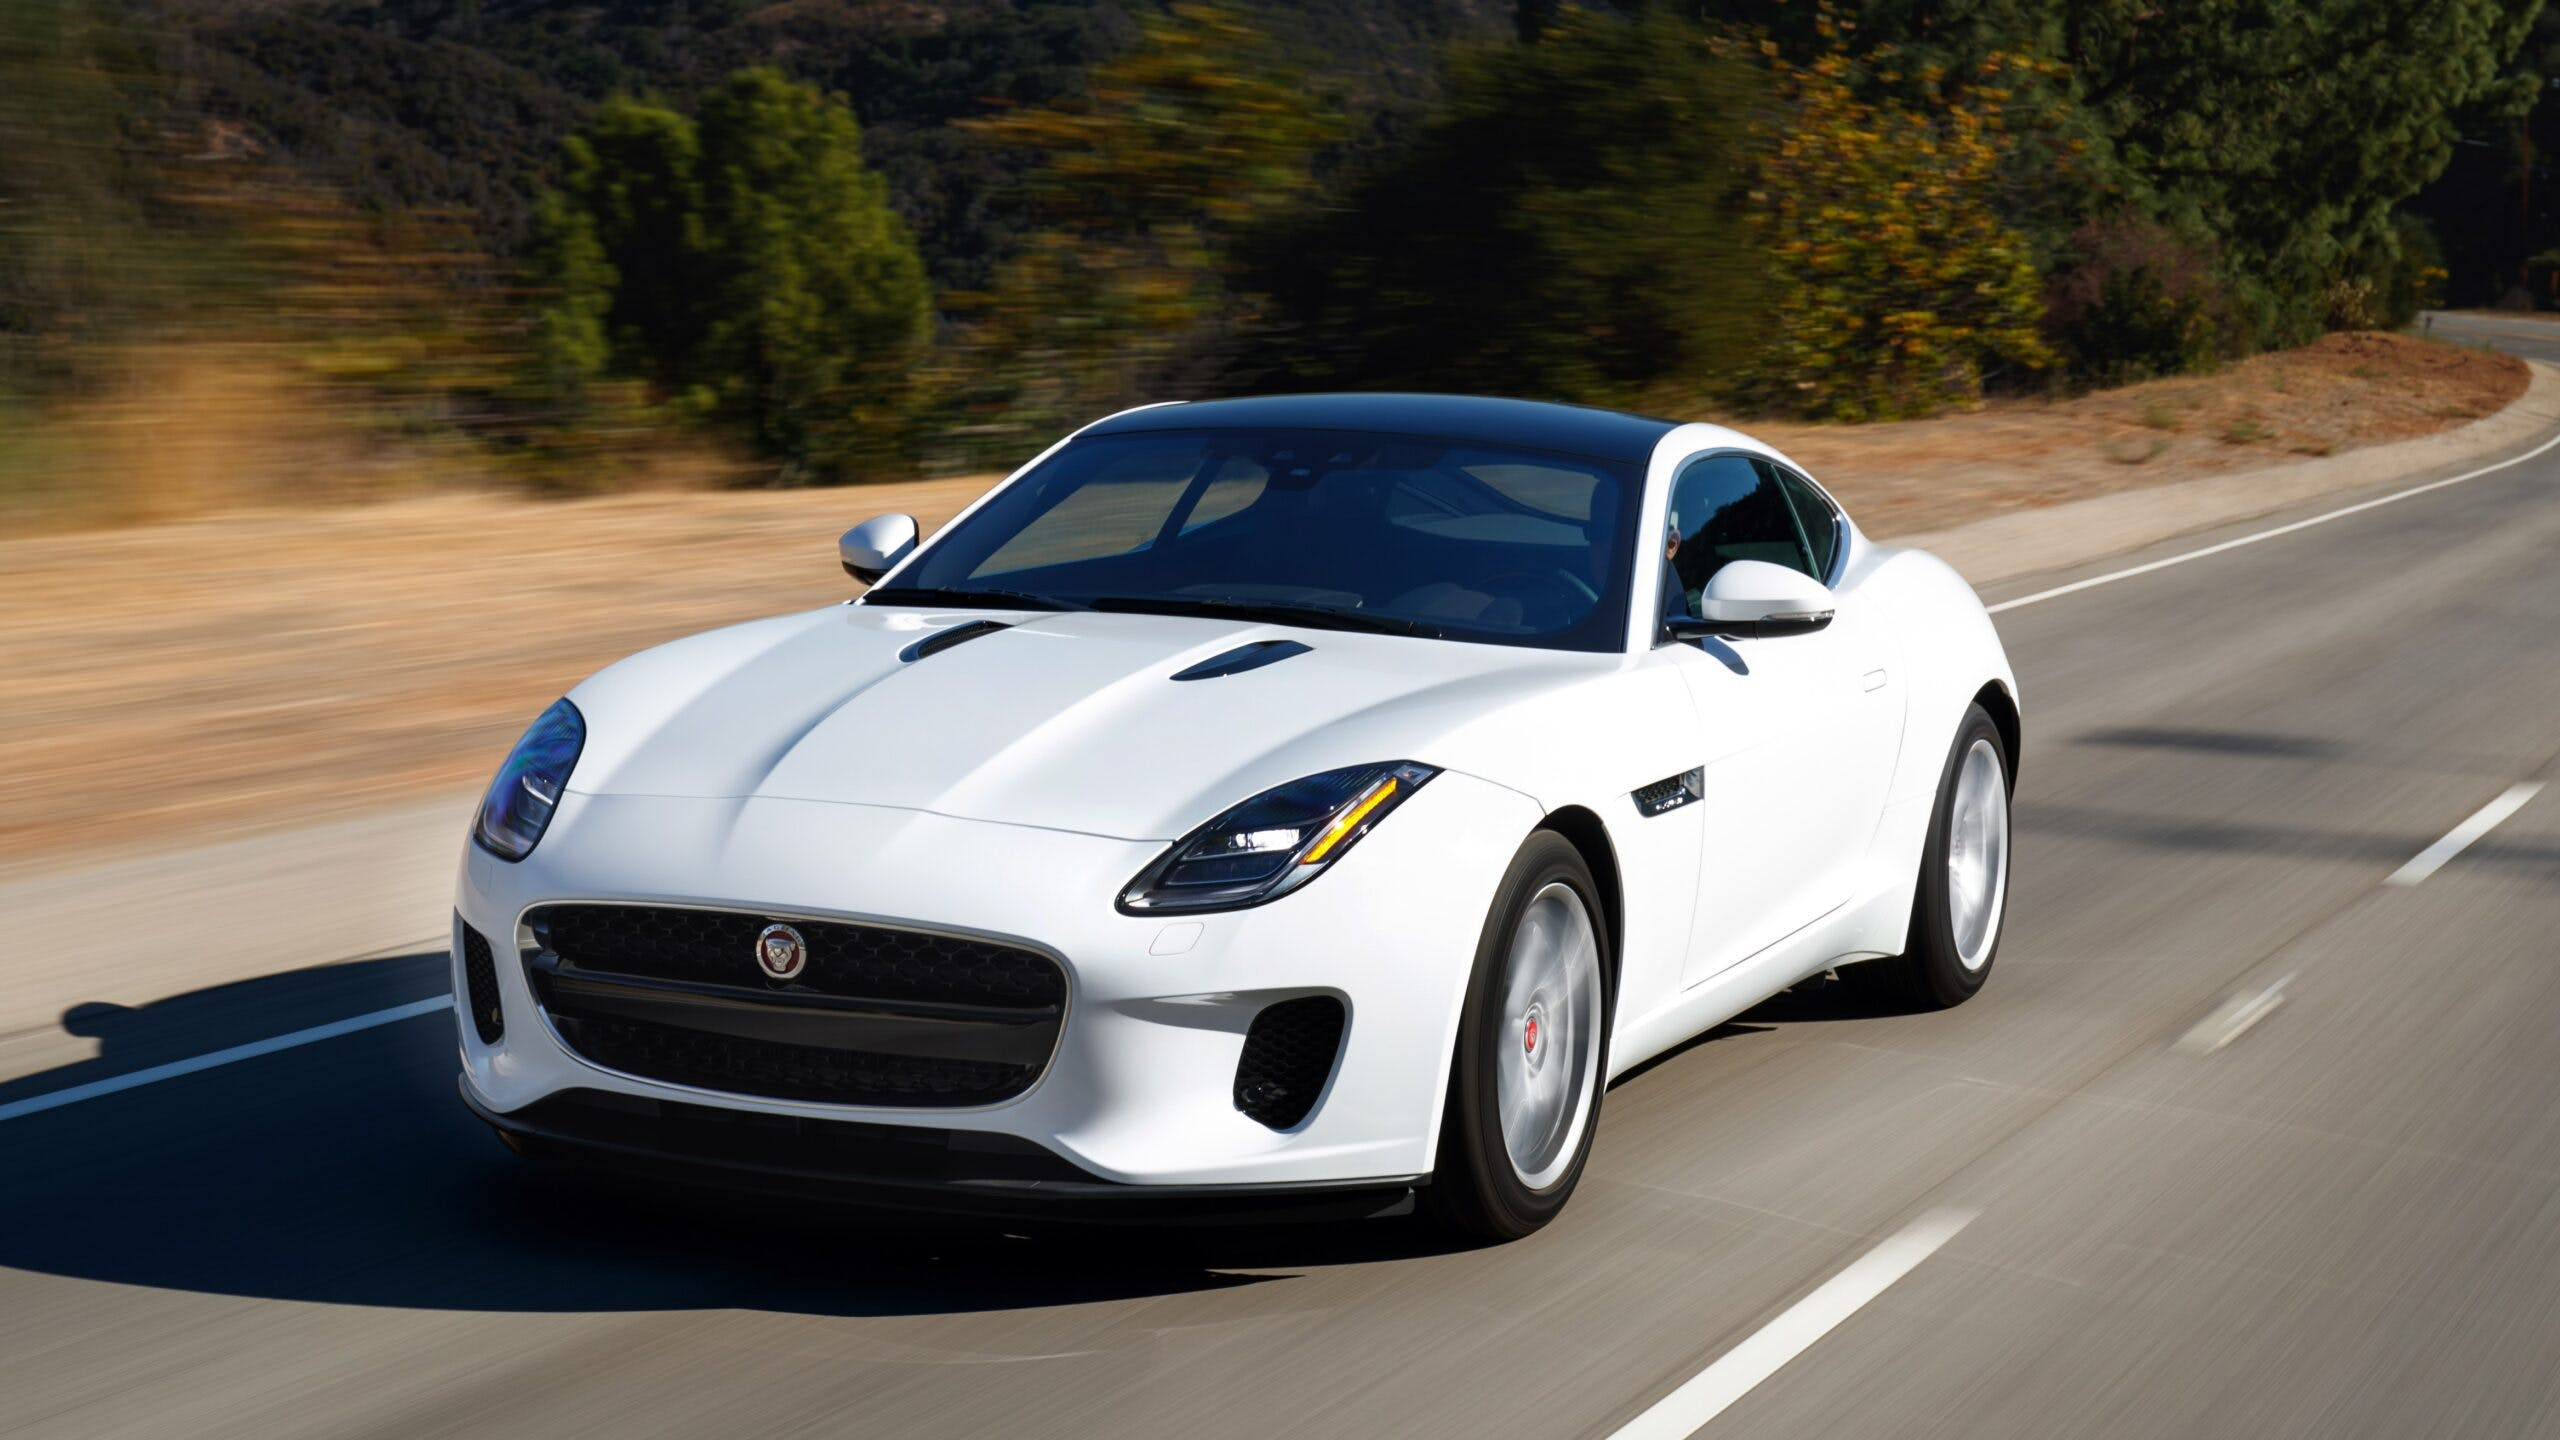 2020 Jaguar F-Type / Photo Credit: Jaguar